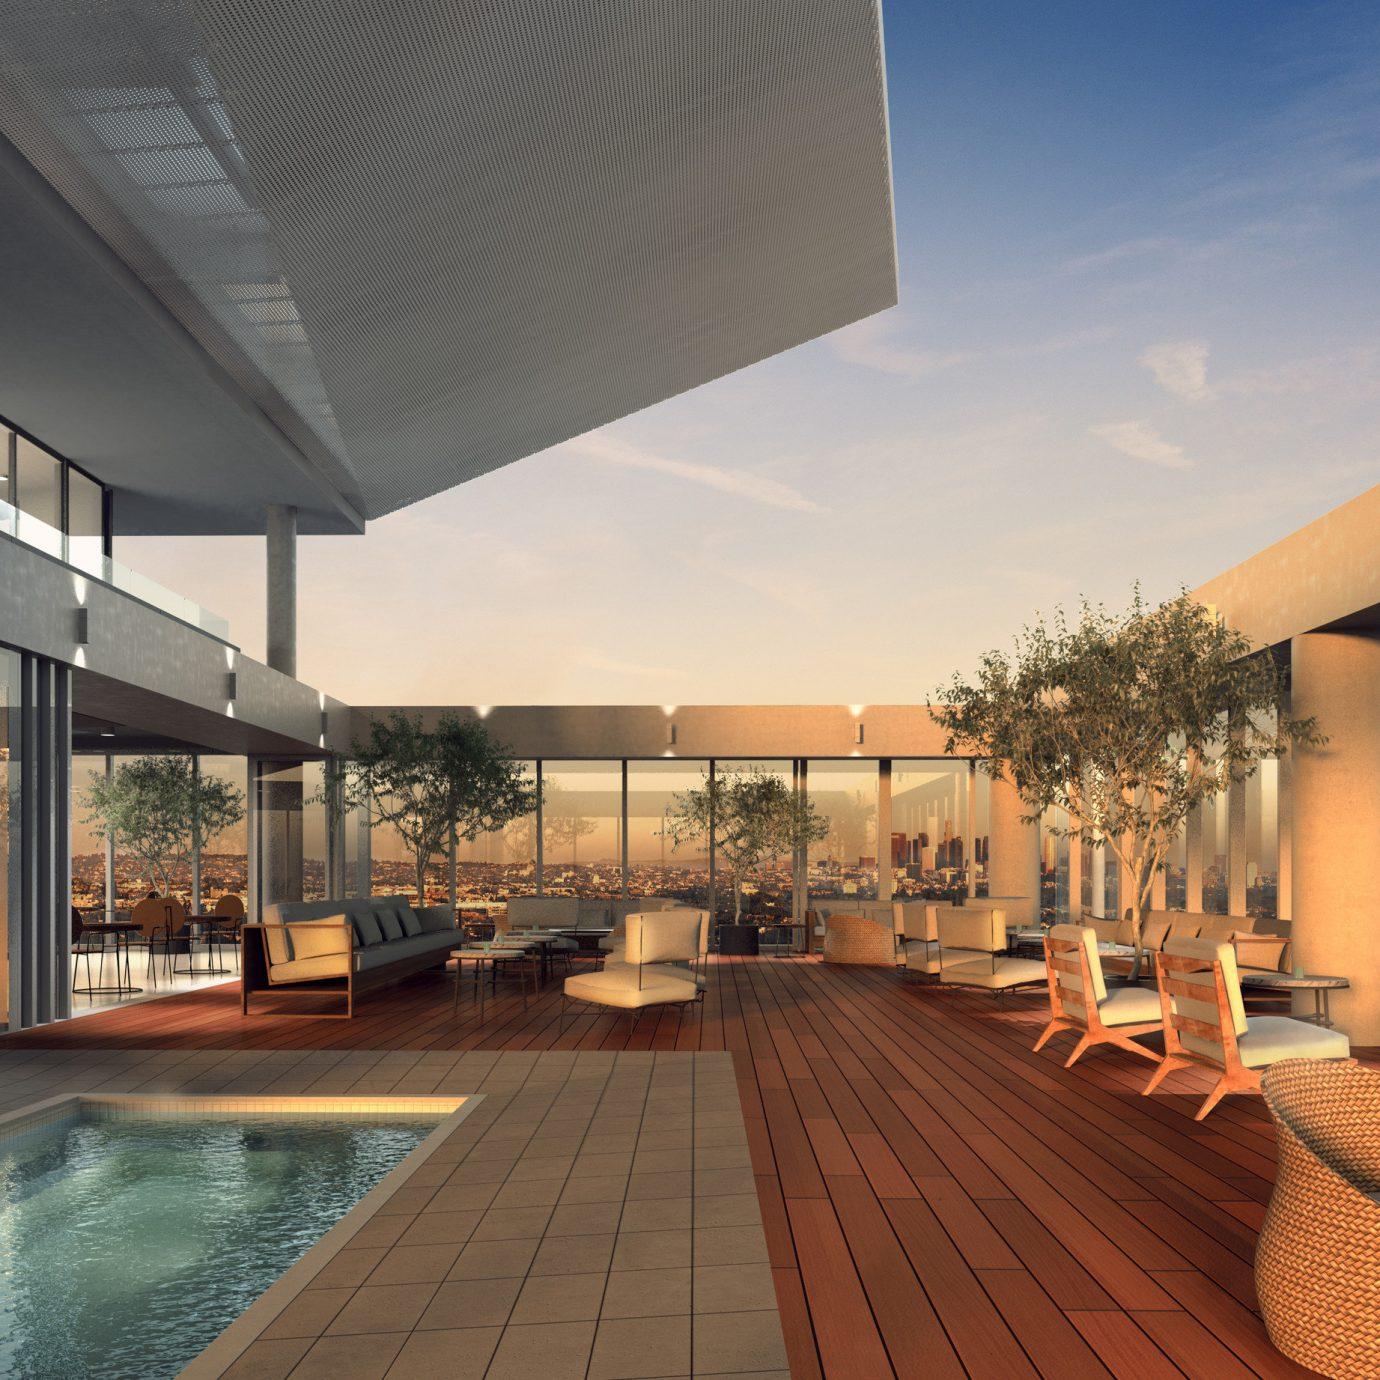 Hotels property Lobby estate Architecture condominium Resort interior design swimming pool real estate daylighting convention center professional headquarters furniture